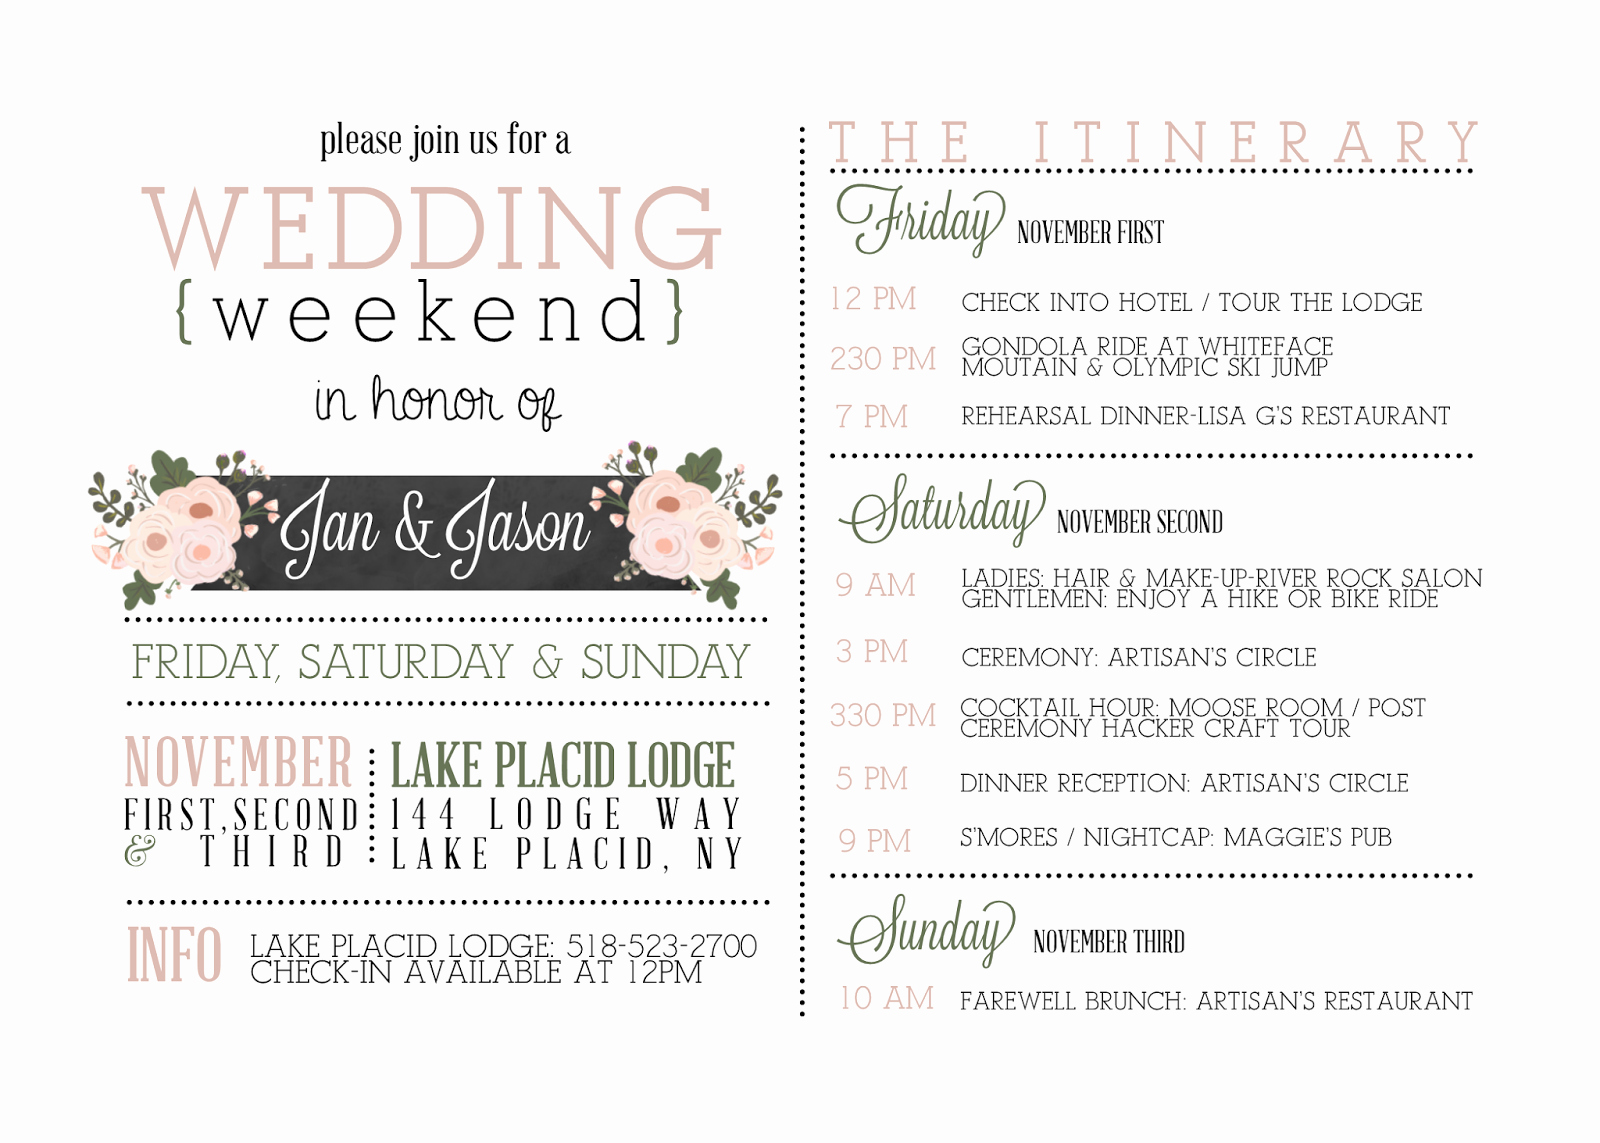 Wedding Itinerary Template Free Fresh Wedding Weekend Itinerary Google Search …